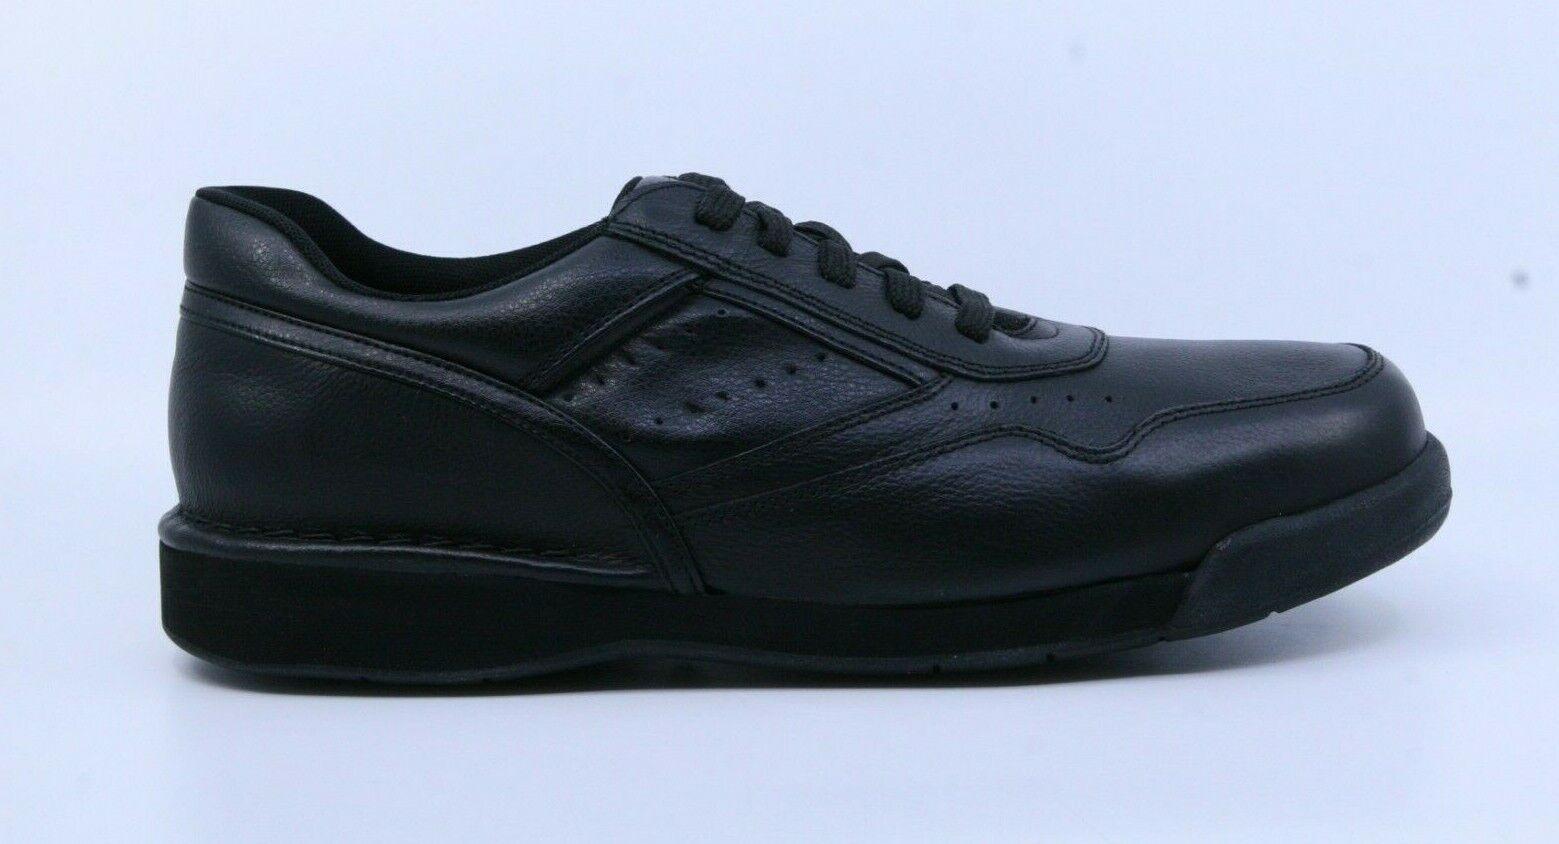 Rockport K71096 para hombre Negro Prowalker zapatos talla 8 (extra grande)